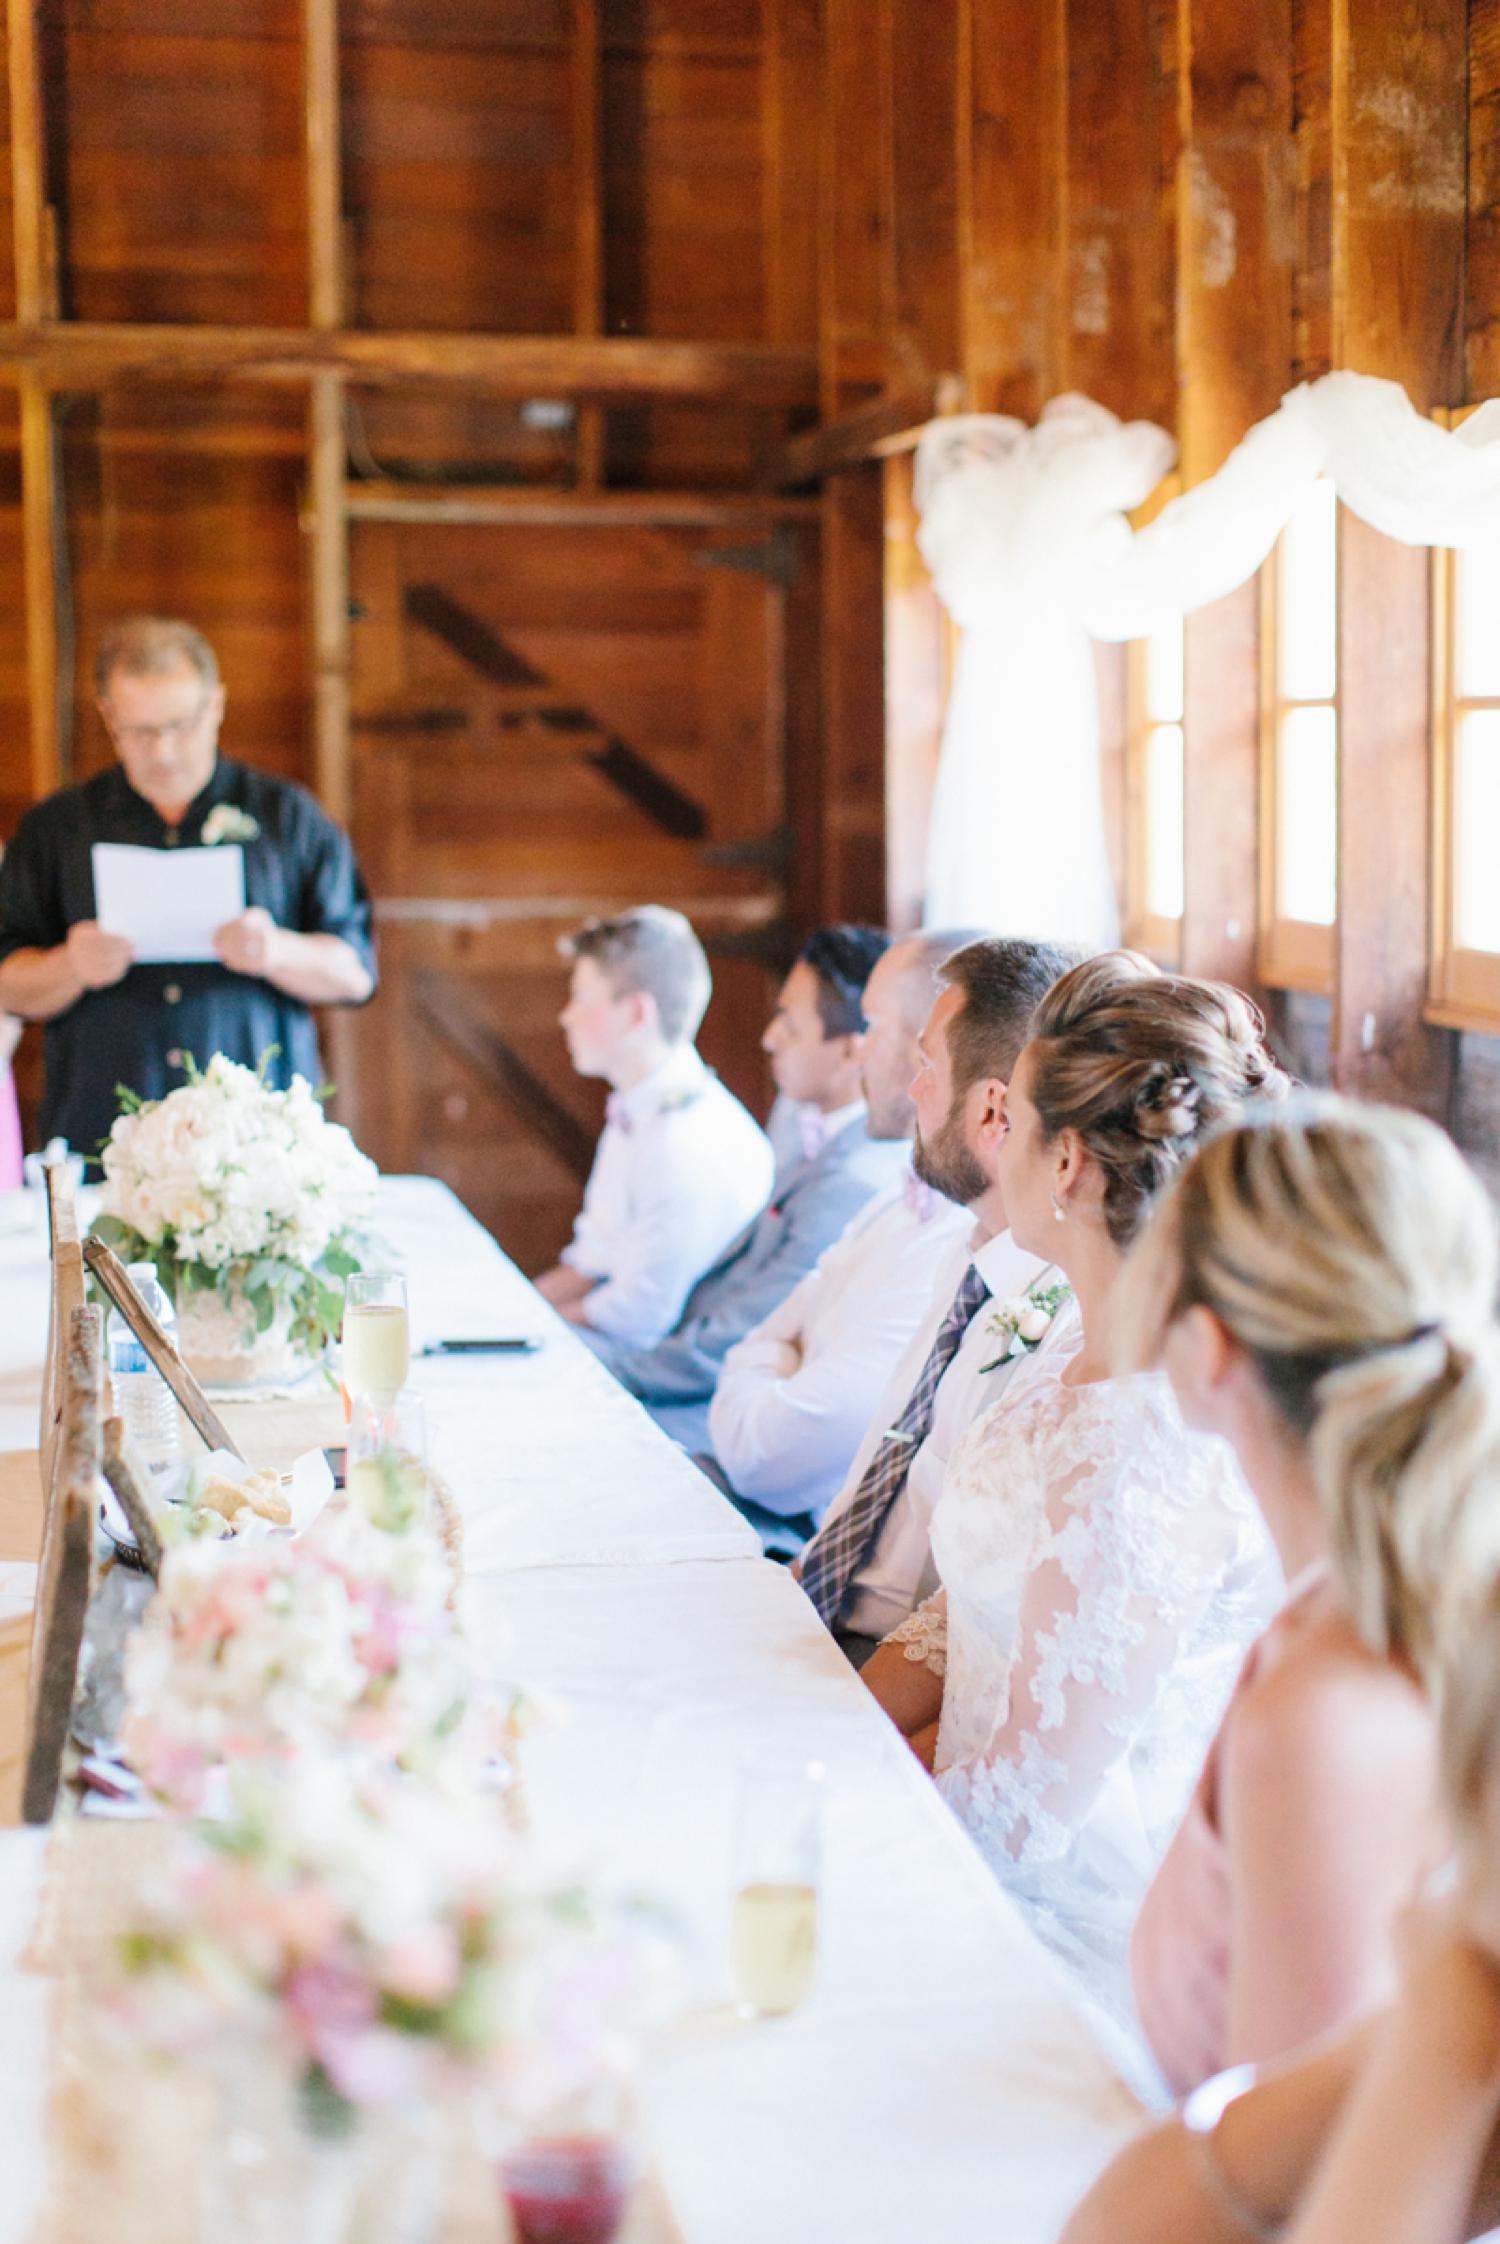 Wenatchee Wedding Photographer   Hampton Hideaway   Summer Rustic Wedding Eastern Washington   Emma Rose Company   Pastel Wedding Inspiration   Lace Wedding   Pacific Northwest Wedding 88.jpg